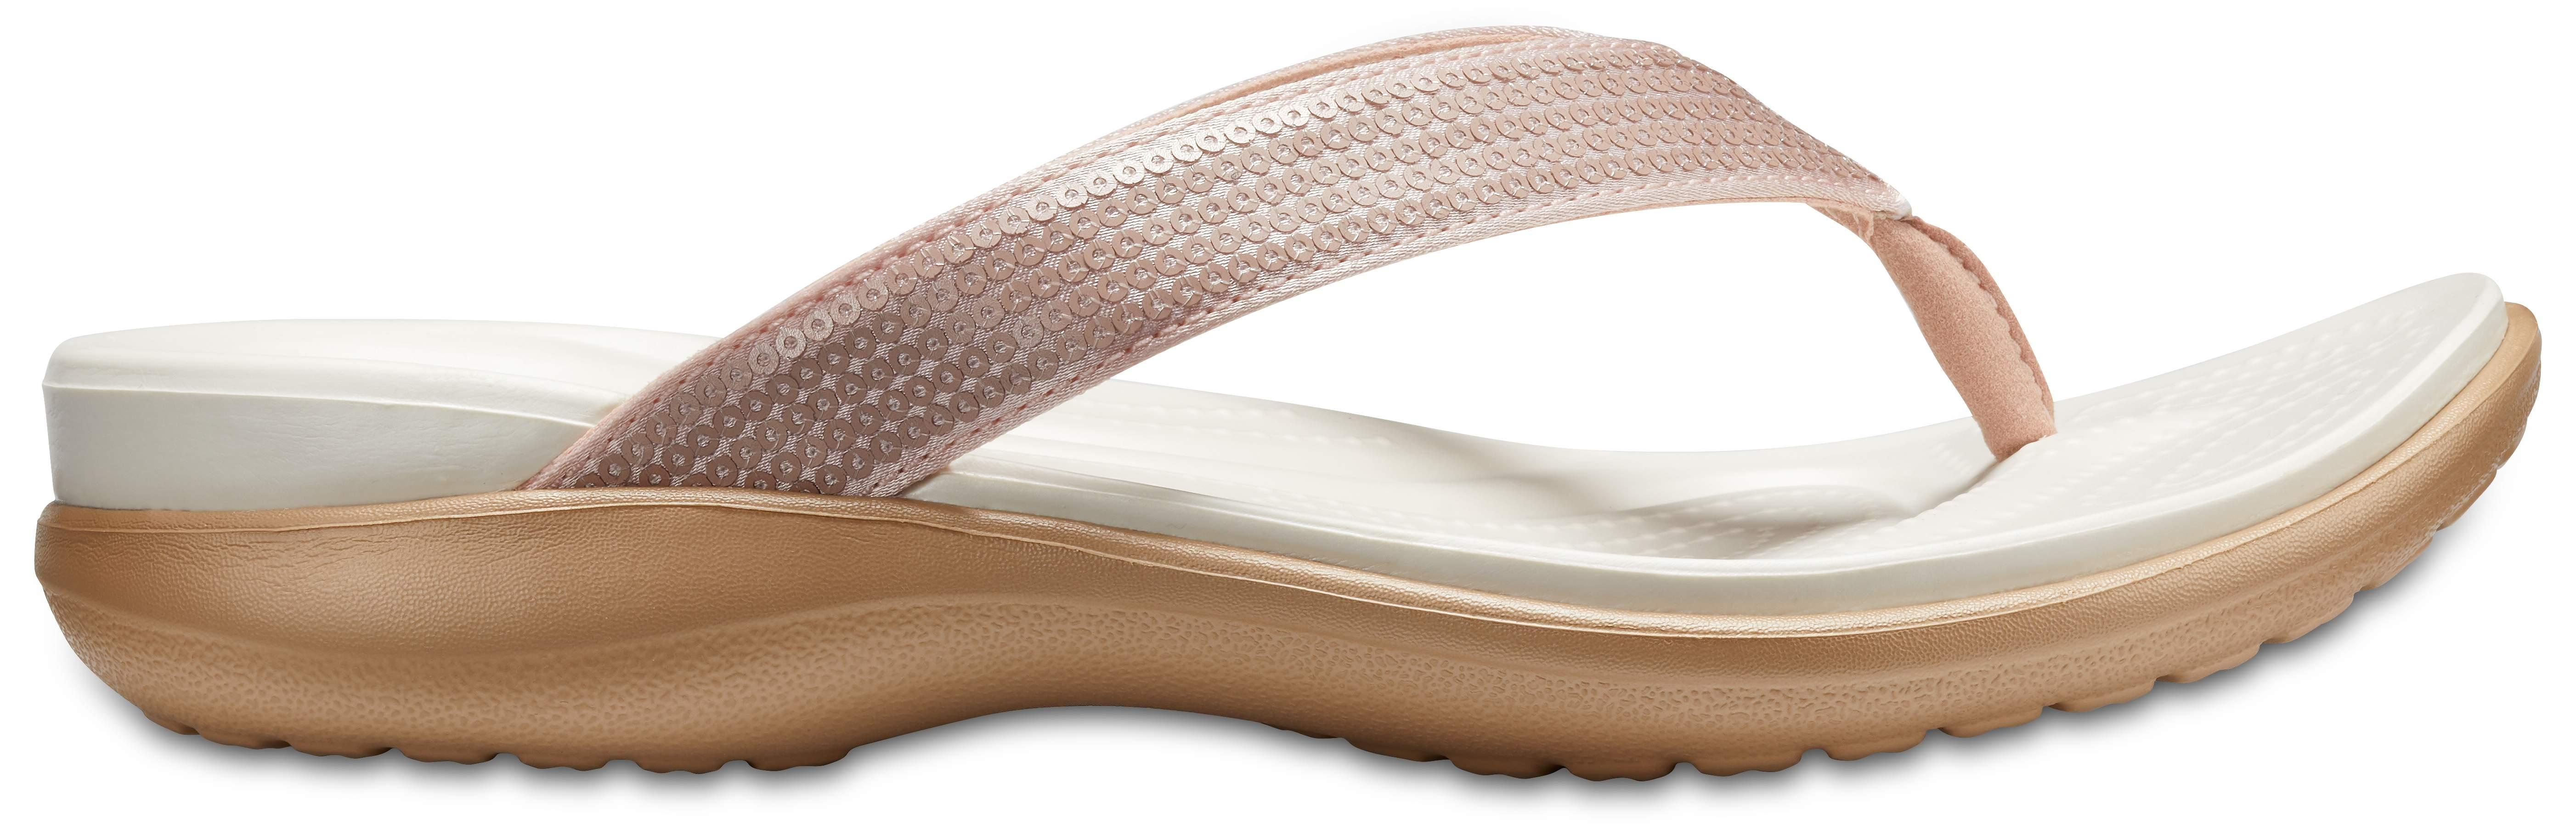 Chaussures Femmes Sandales Flip Crocs Capri V Sequin [204311 Black]